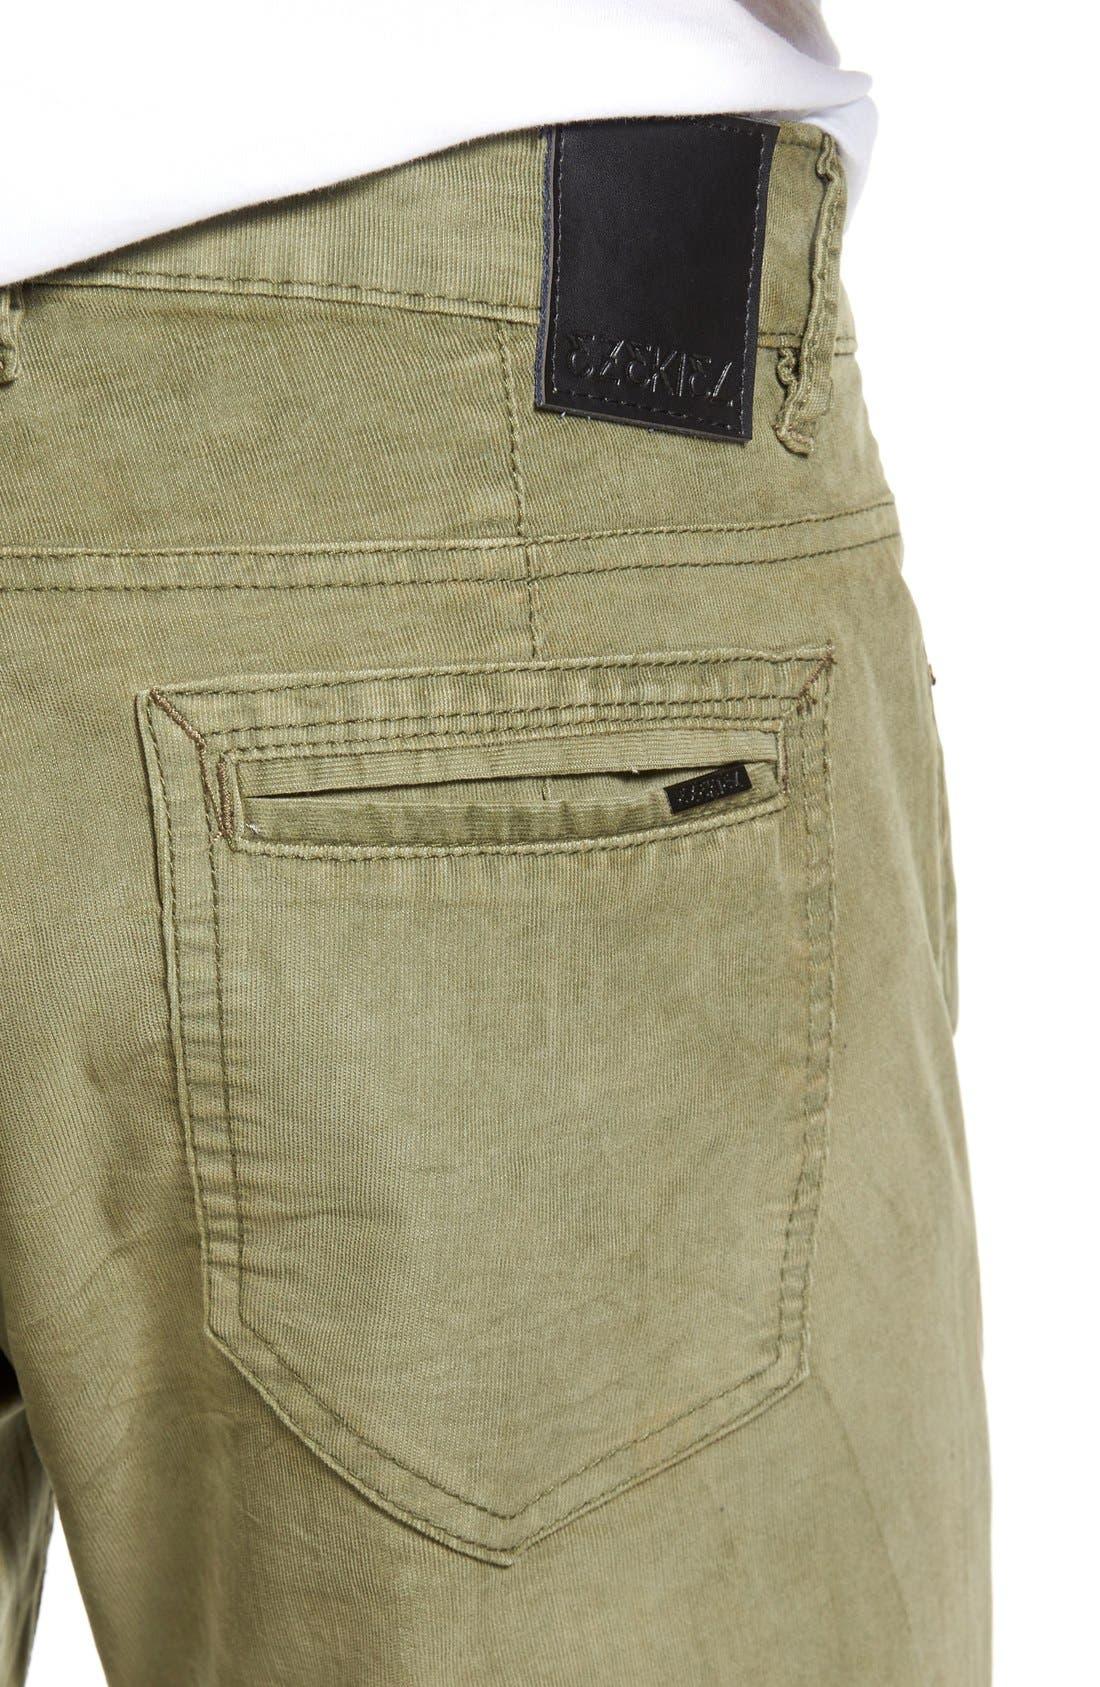 Bryce Chopper Slim Fit Corduroy Pants,                             Alternate thumbnail 9, color,                             302